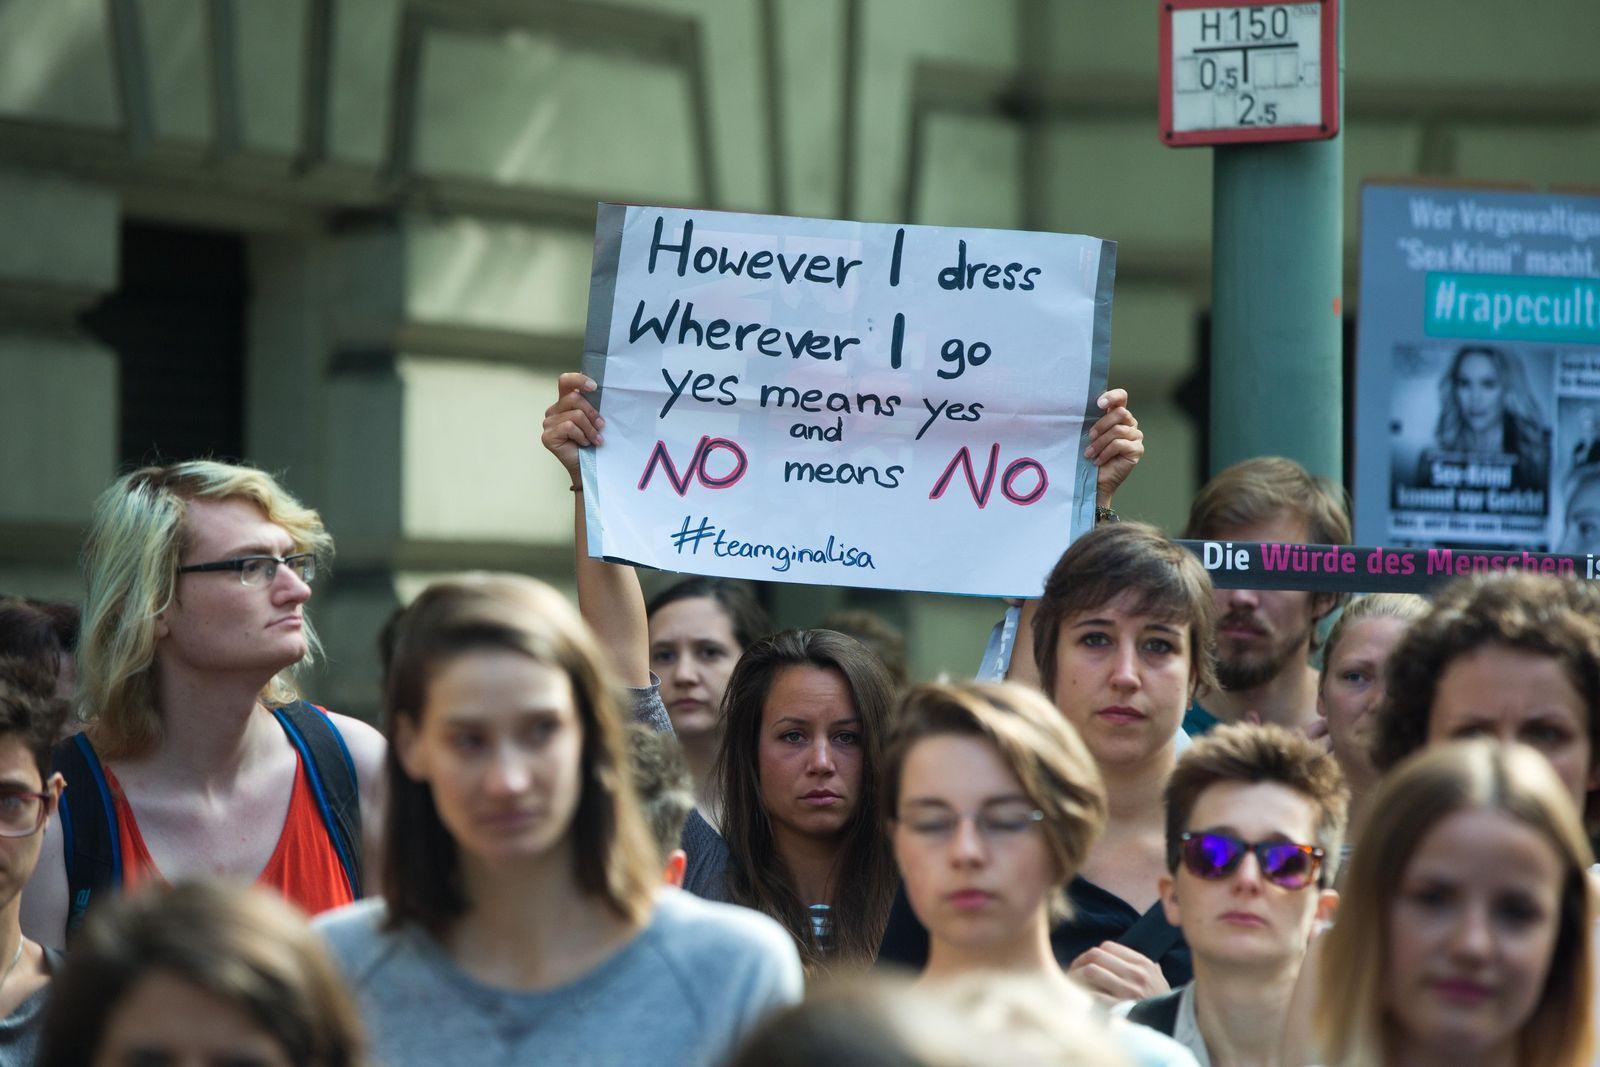 Sexualstraftat/ sexuelle Gewalt/ Protest